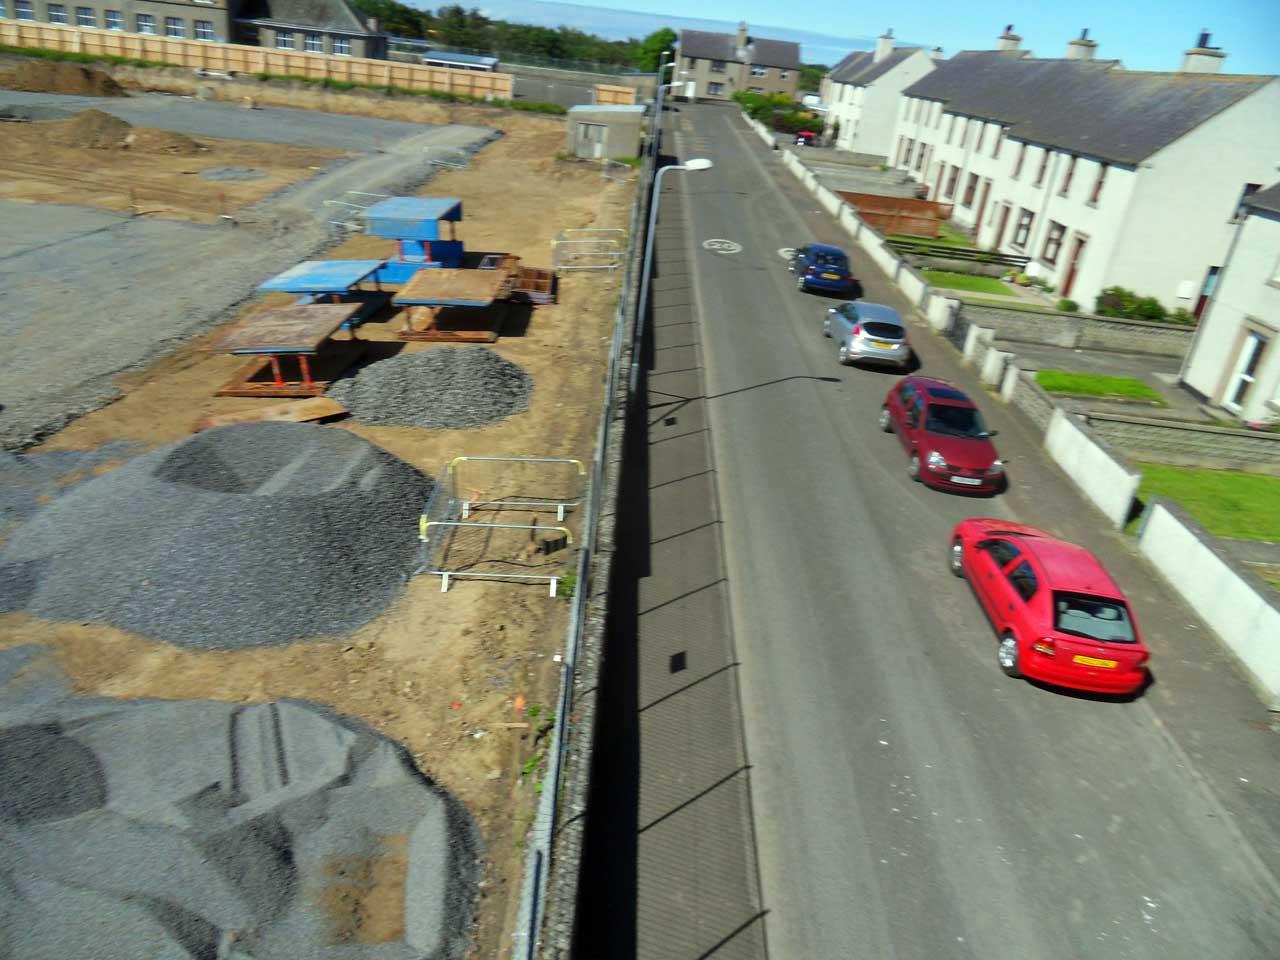 Photo: New Noss Primary School, Wick 24 June 2014